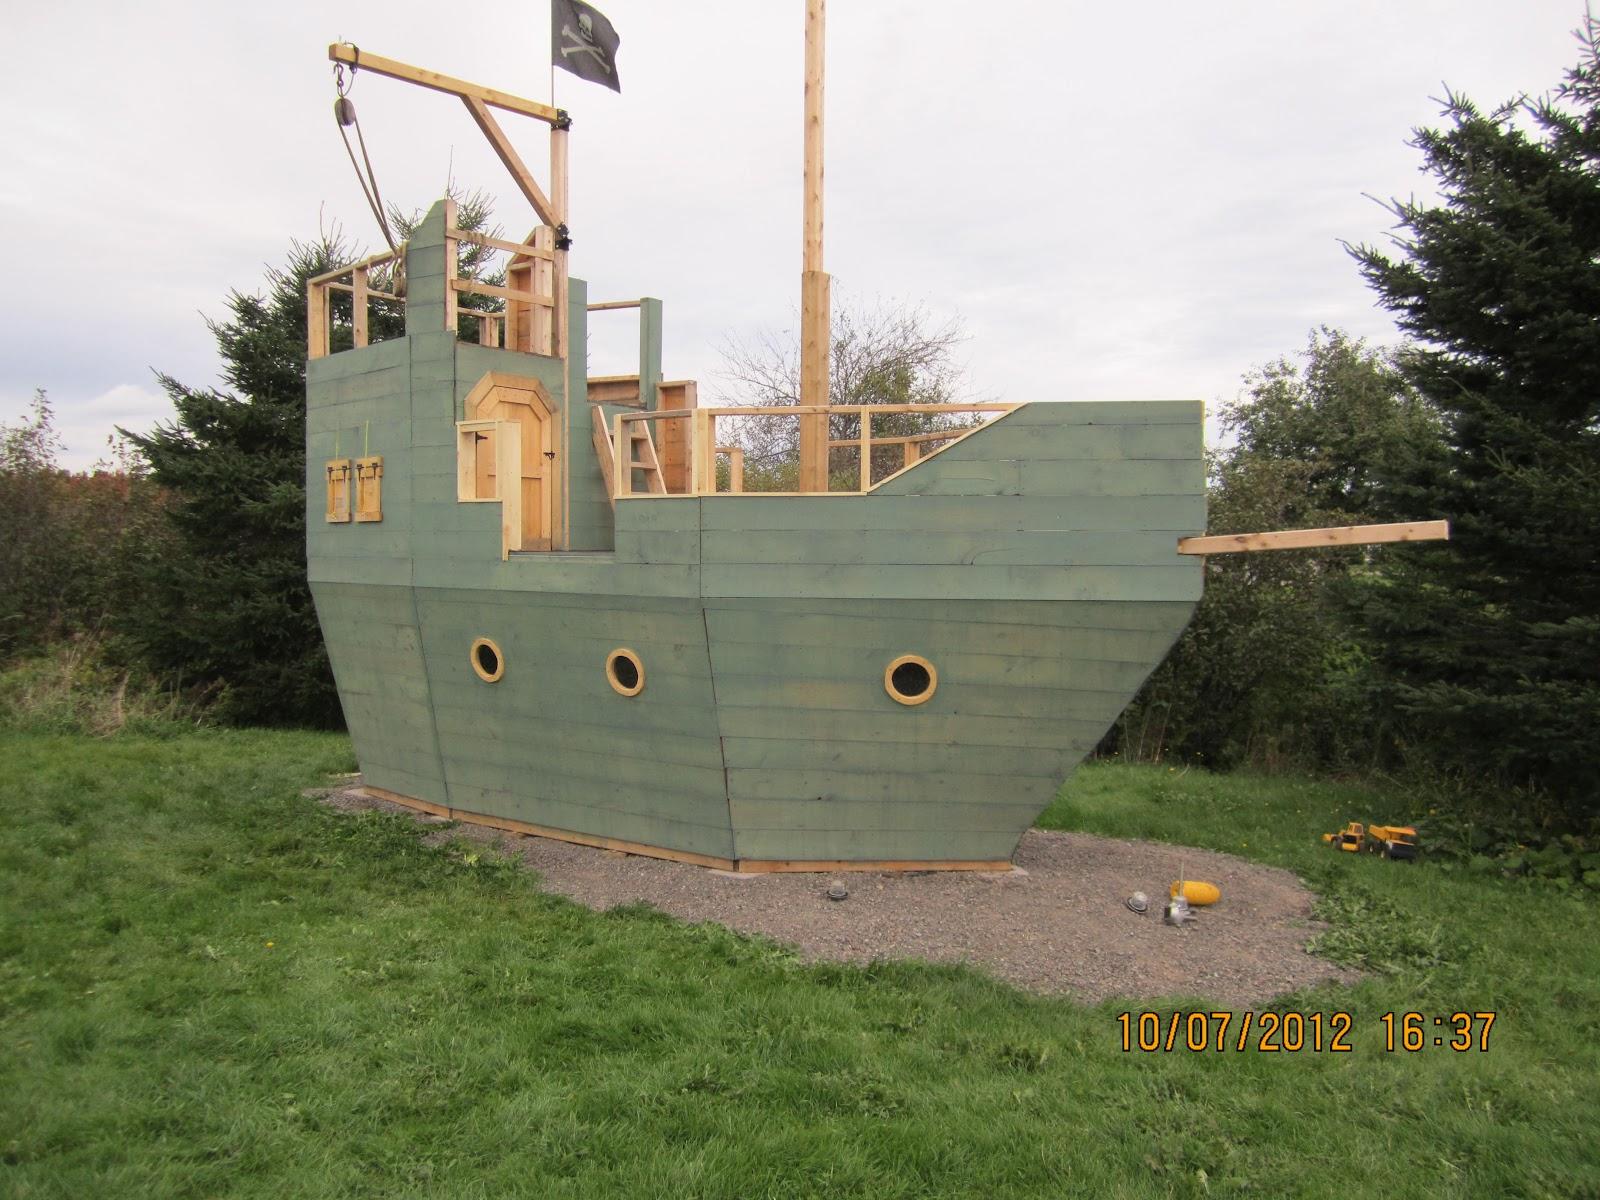 backyard kidz backyard pirate ship playhouse the paint